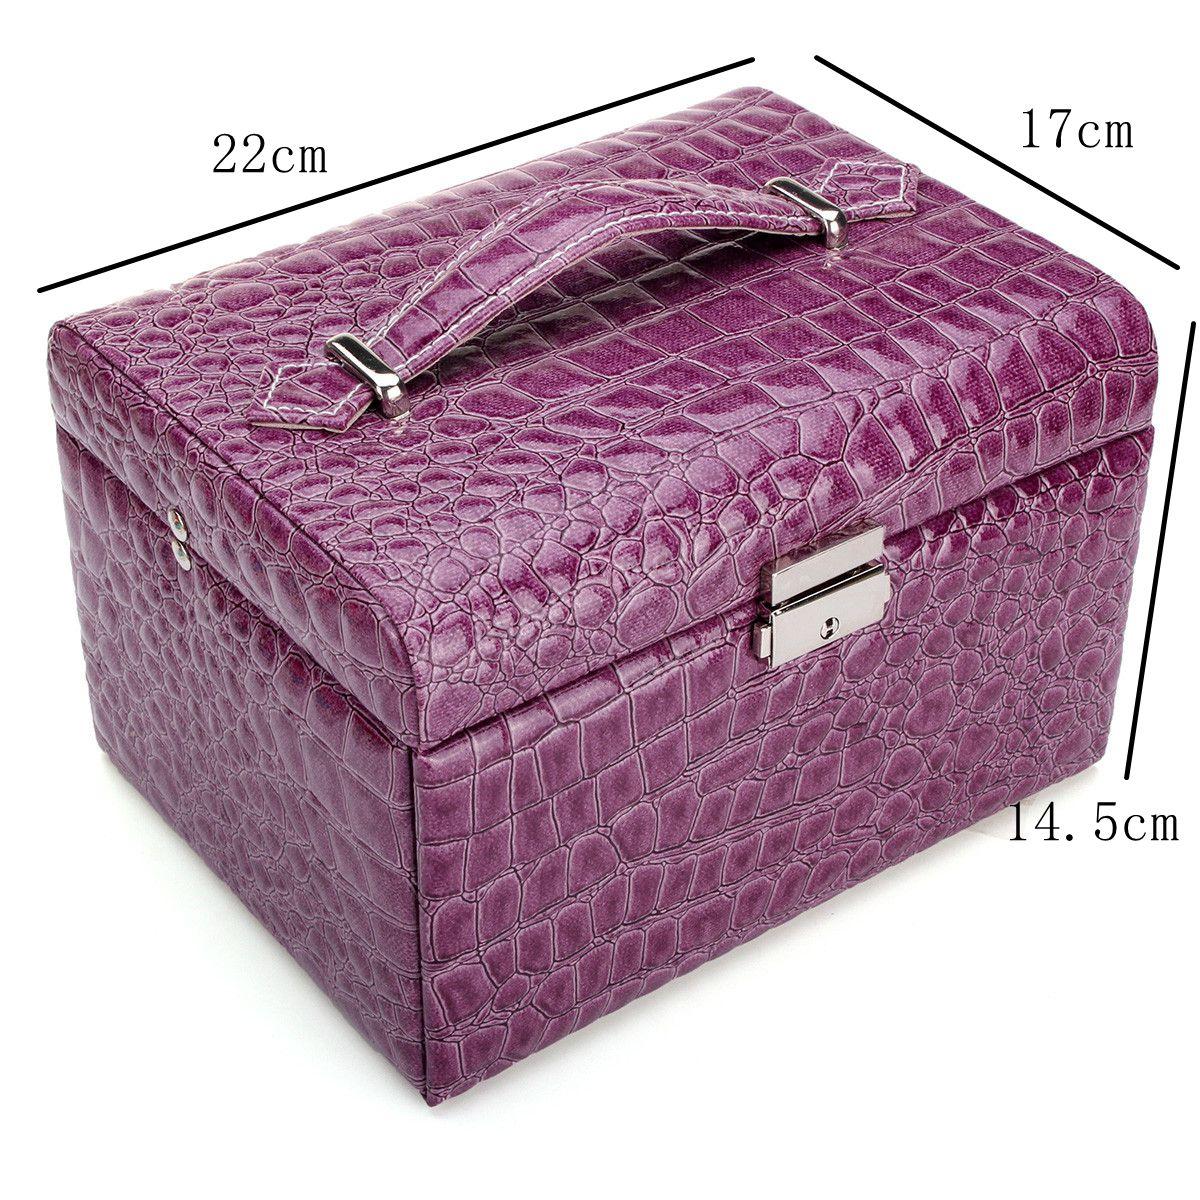 Storage Container Organizer Holder Jewelry Boxes